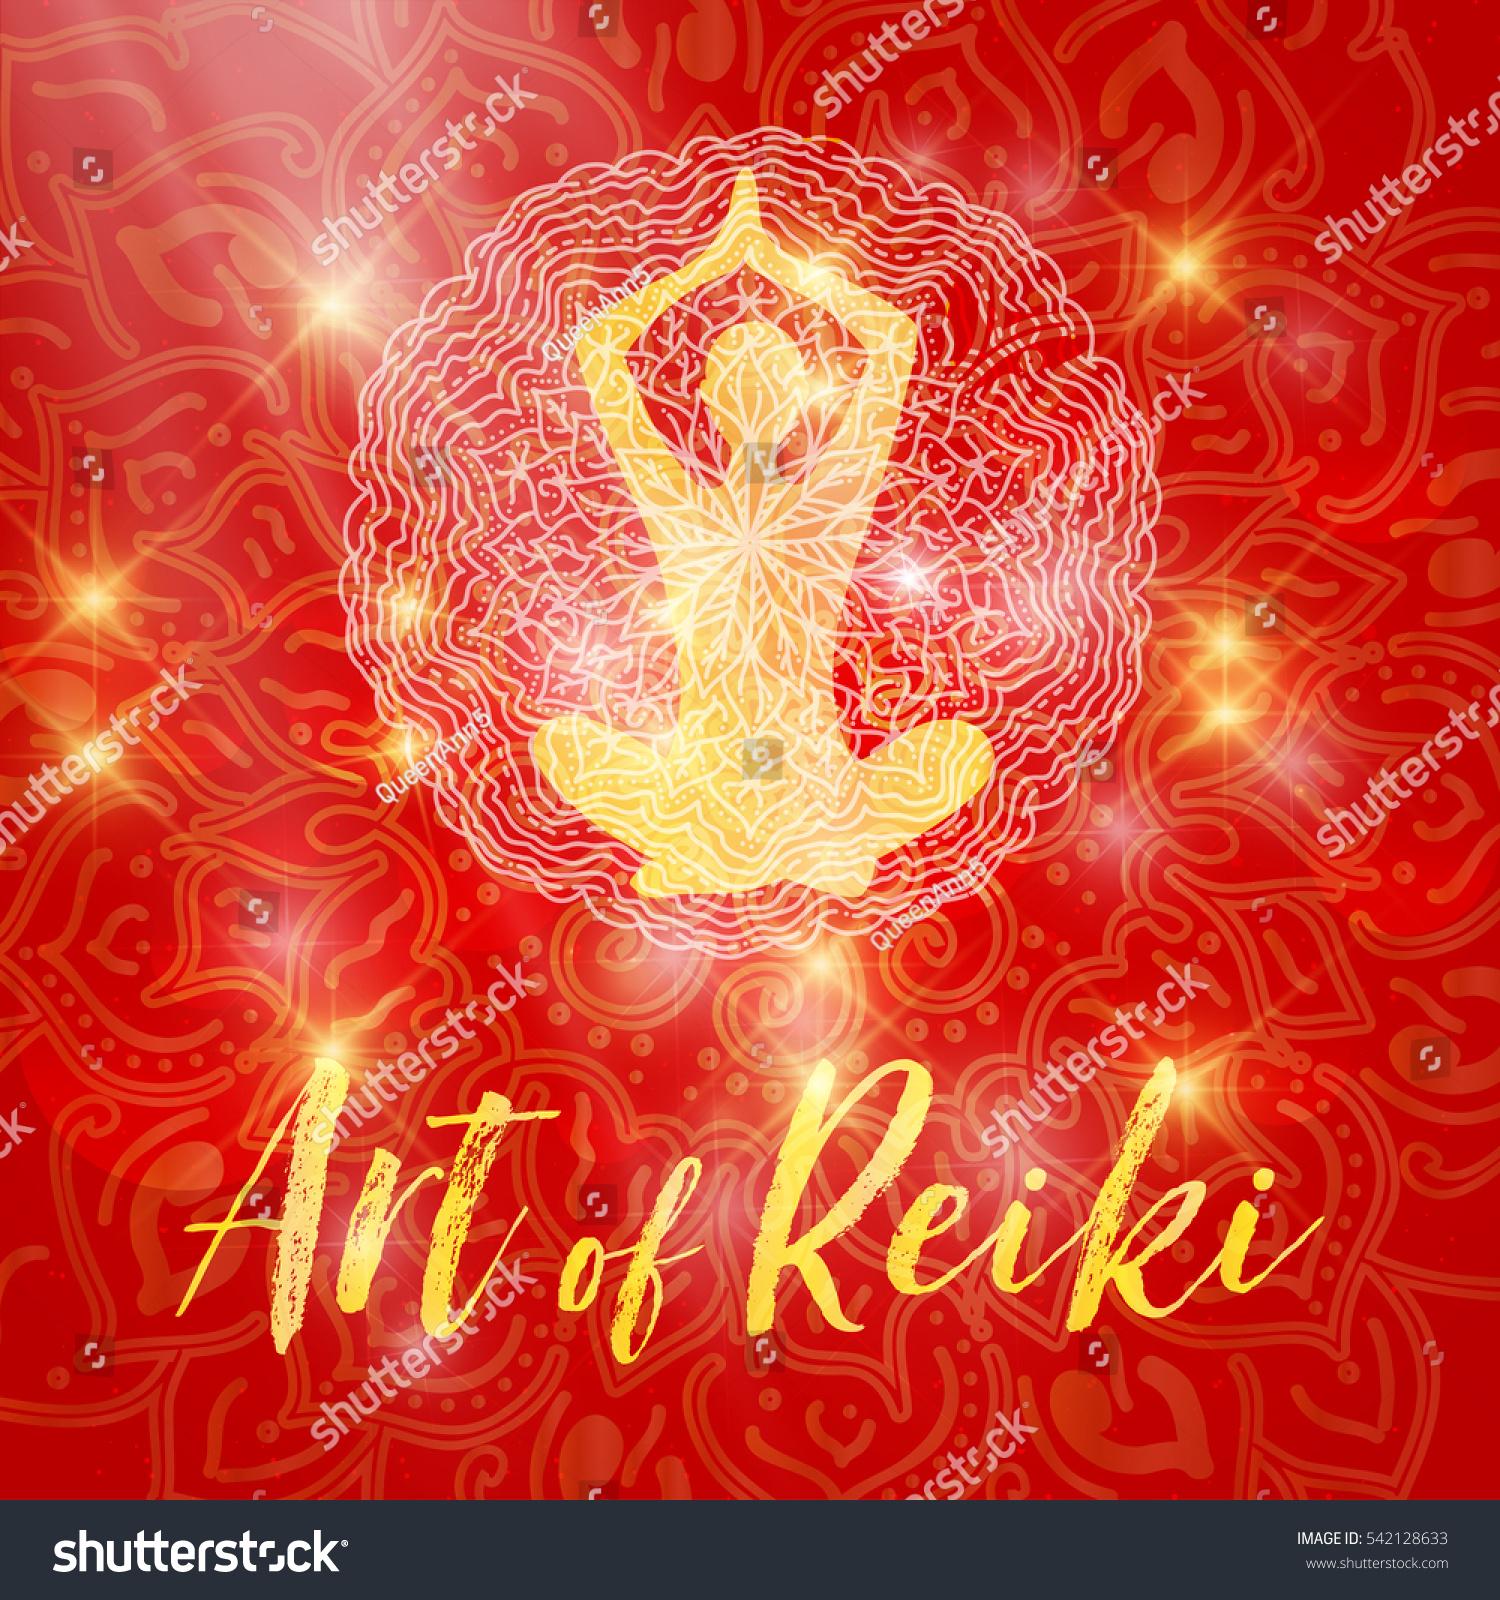 Sacred geometry reiki symbol word reiki stock vector 542128633 sacred geometry reiki symbol the word reiki is made up of two japanese words biocorpaavc